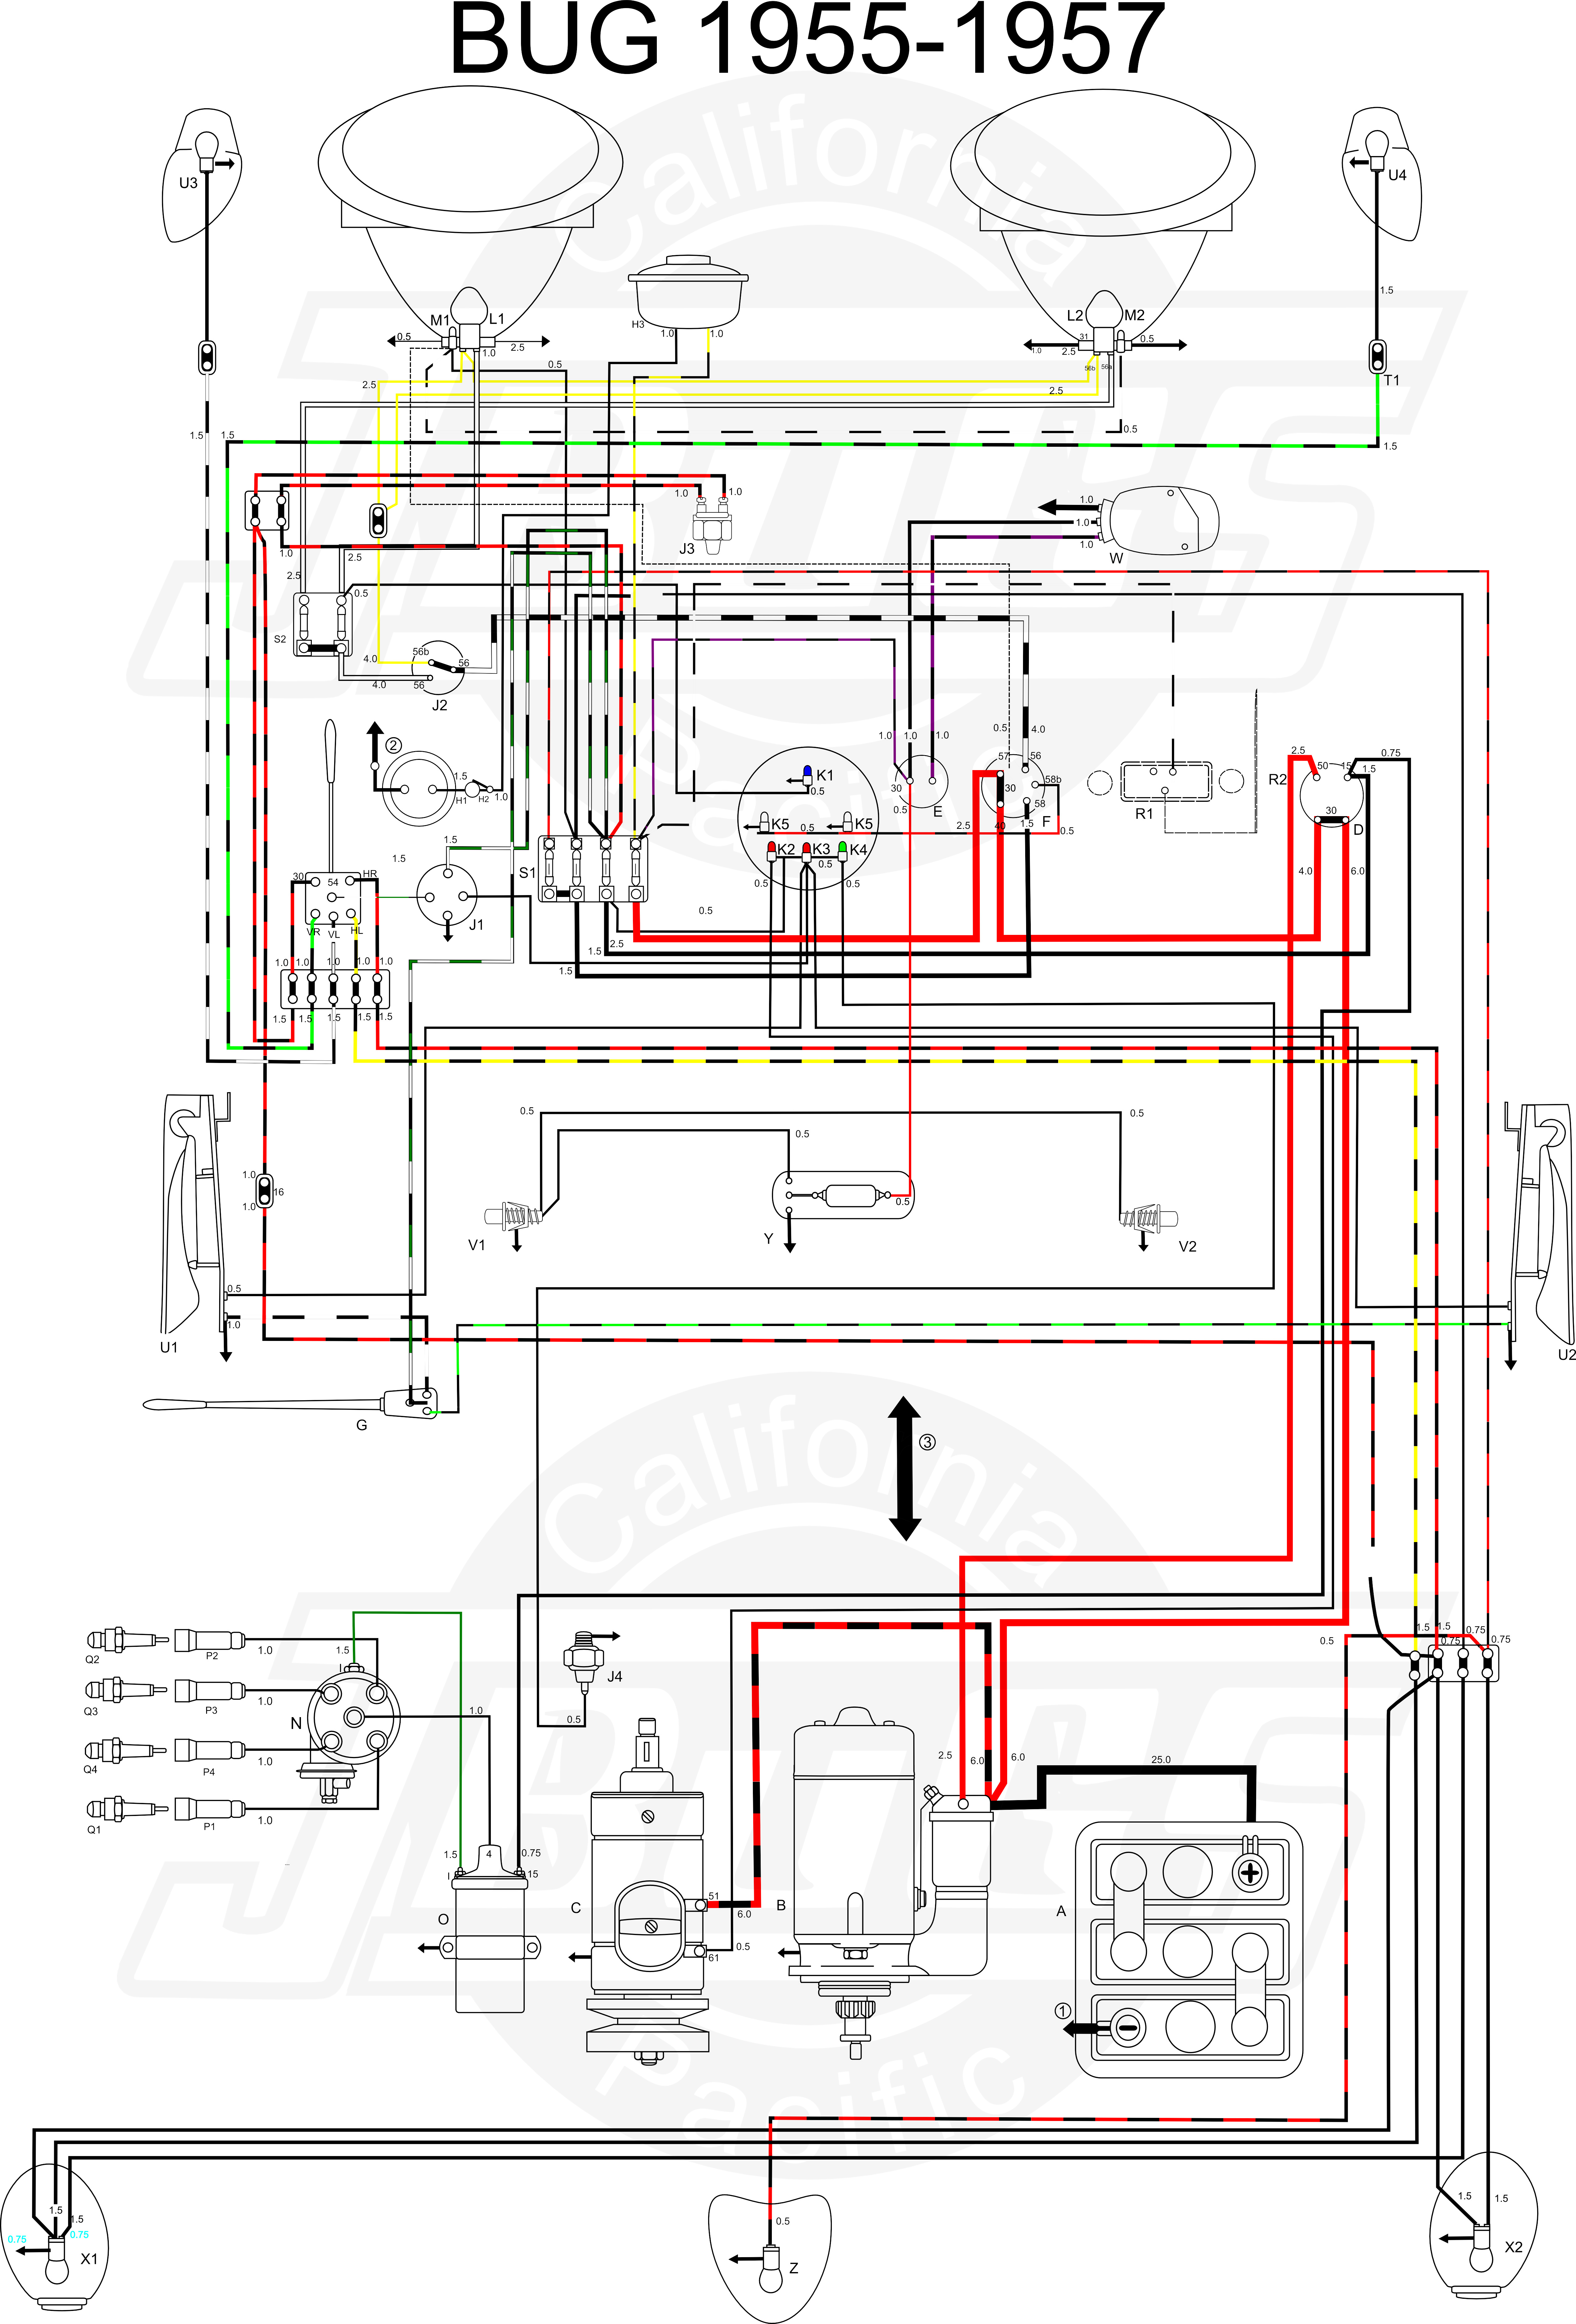 Prime Diagram Parts Bug Basic Electronics Wiring Diagram Wiring Cloud Uslyletkolfr09Org